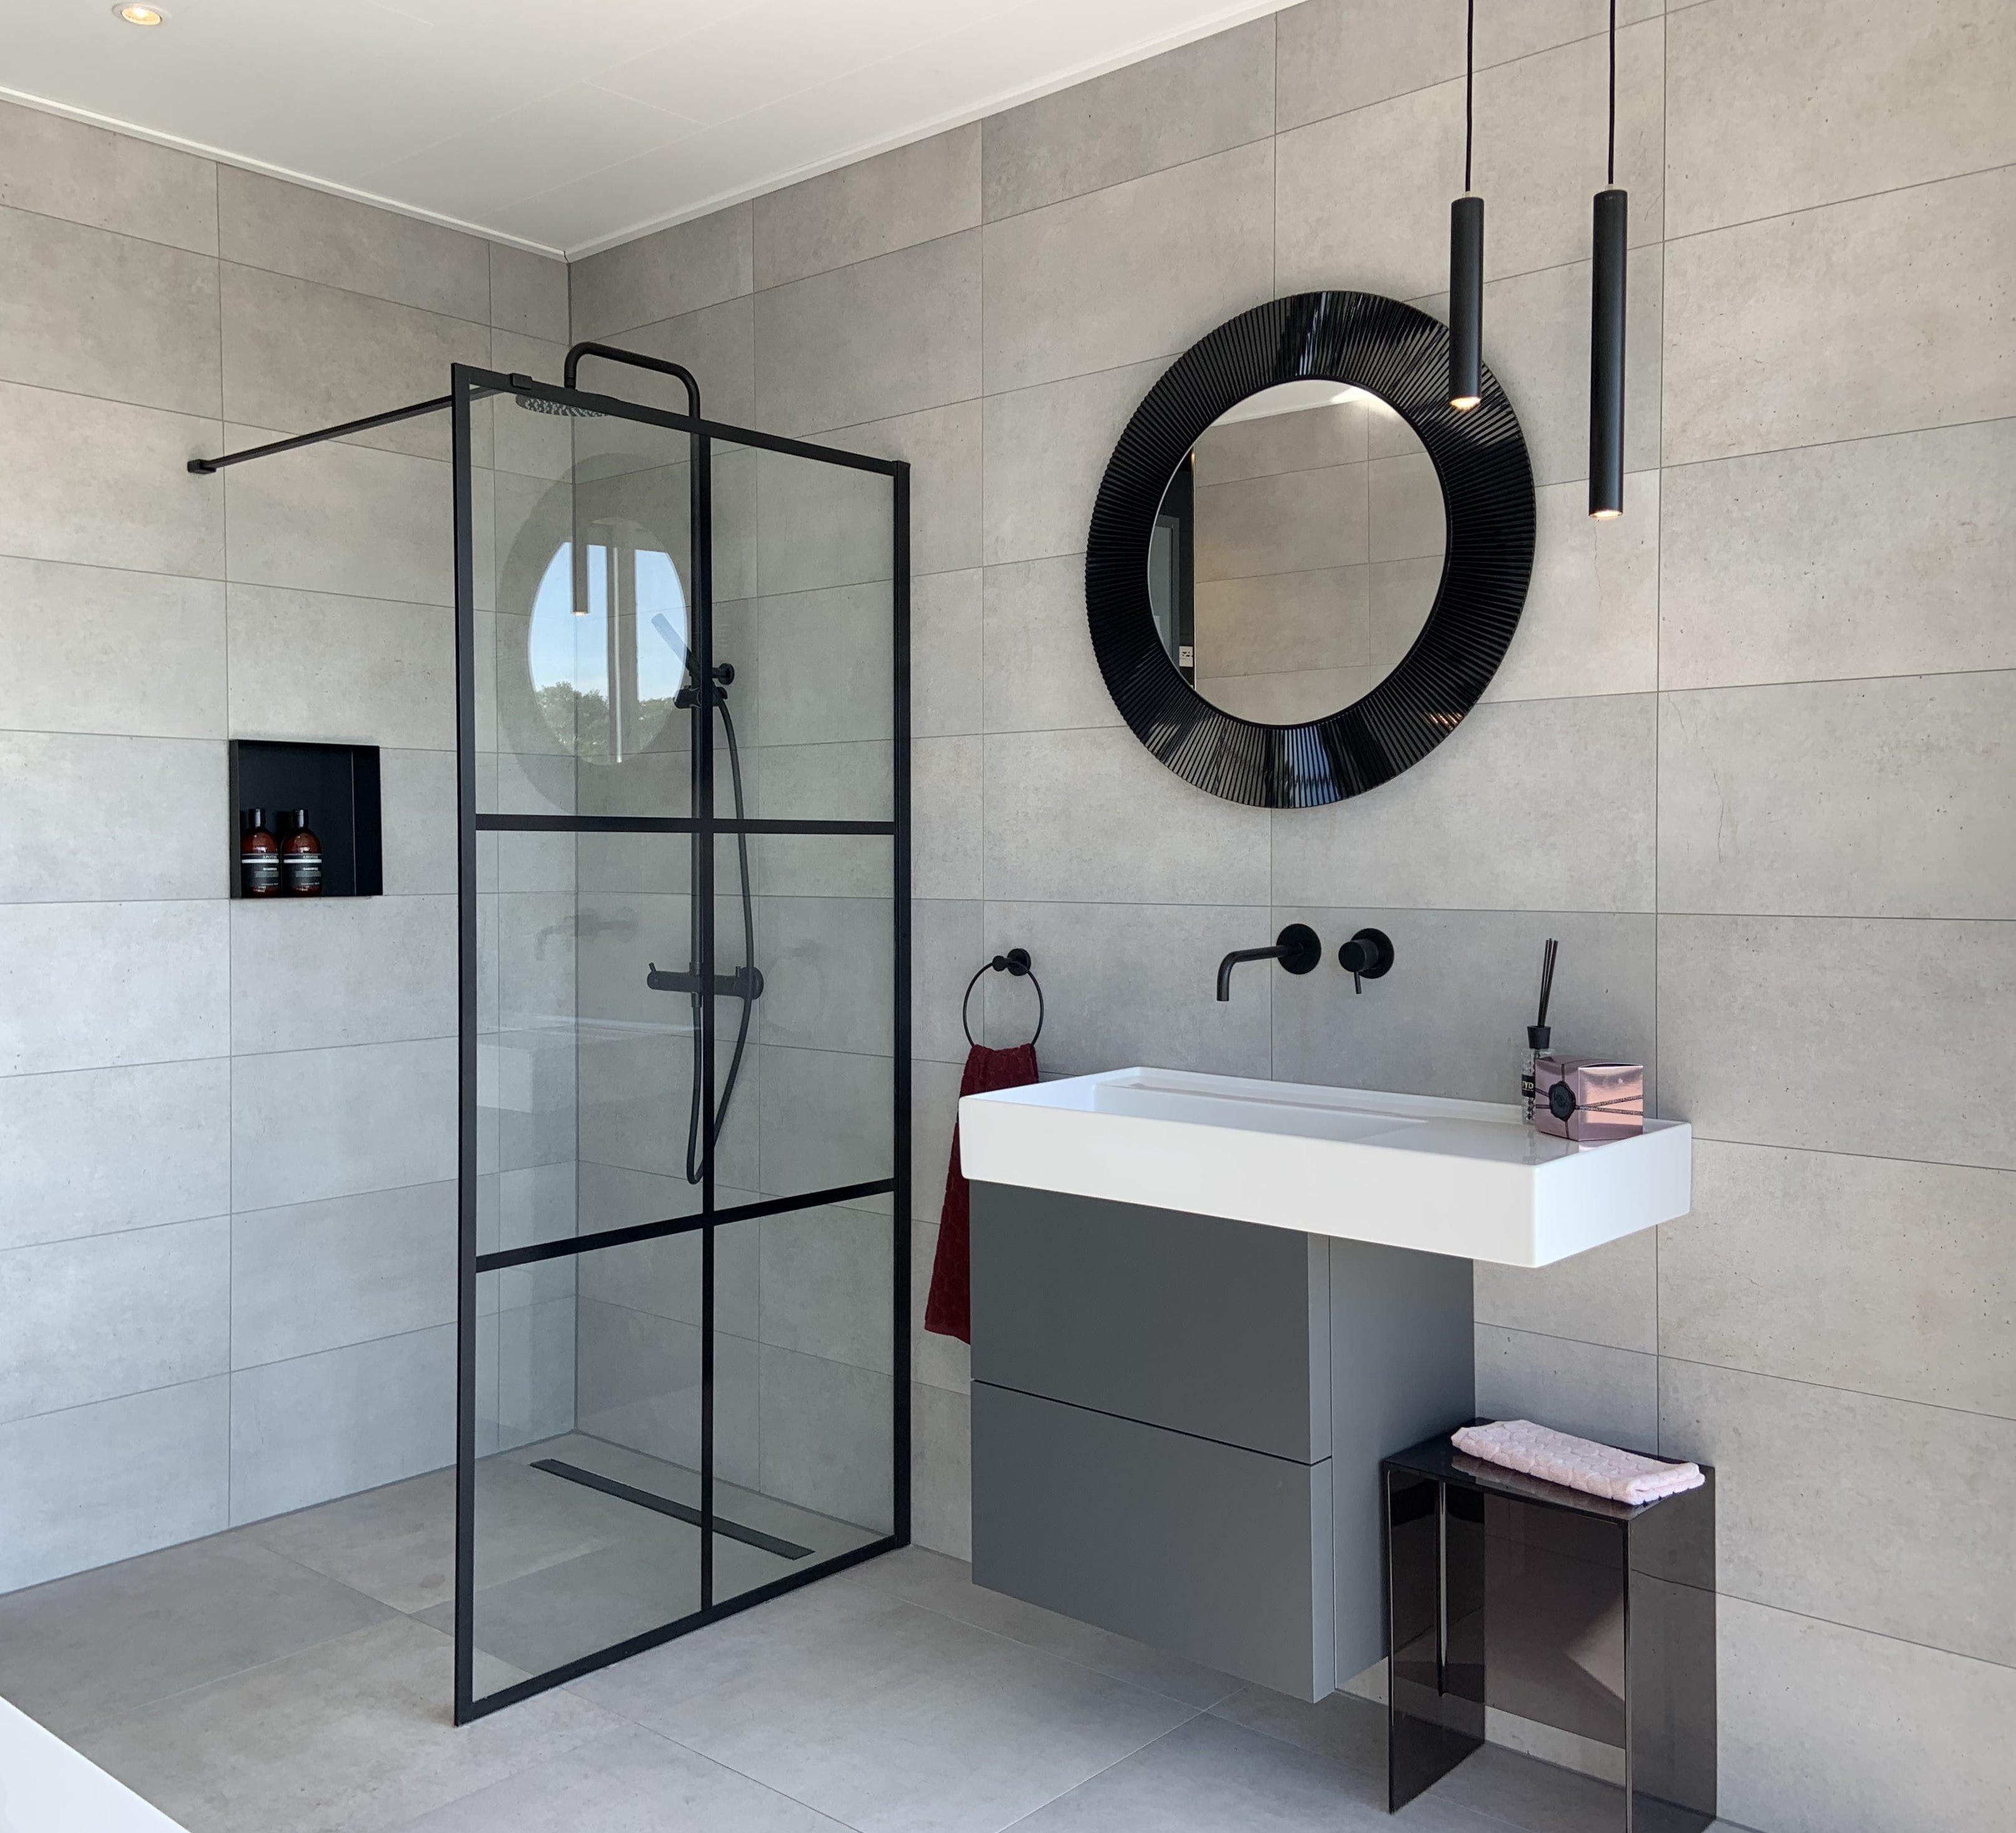 showroom-sanitair-witzand-bouwmaterialen